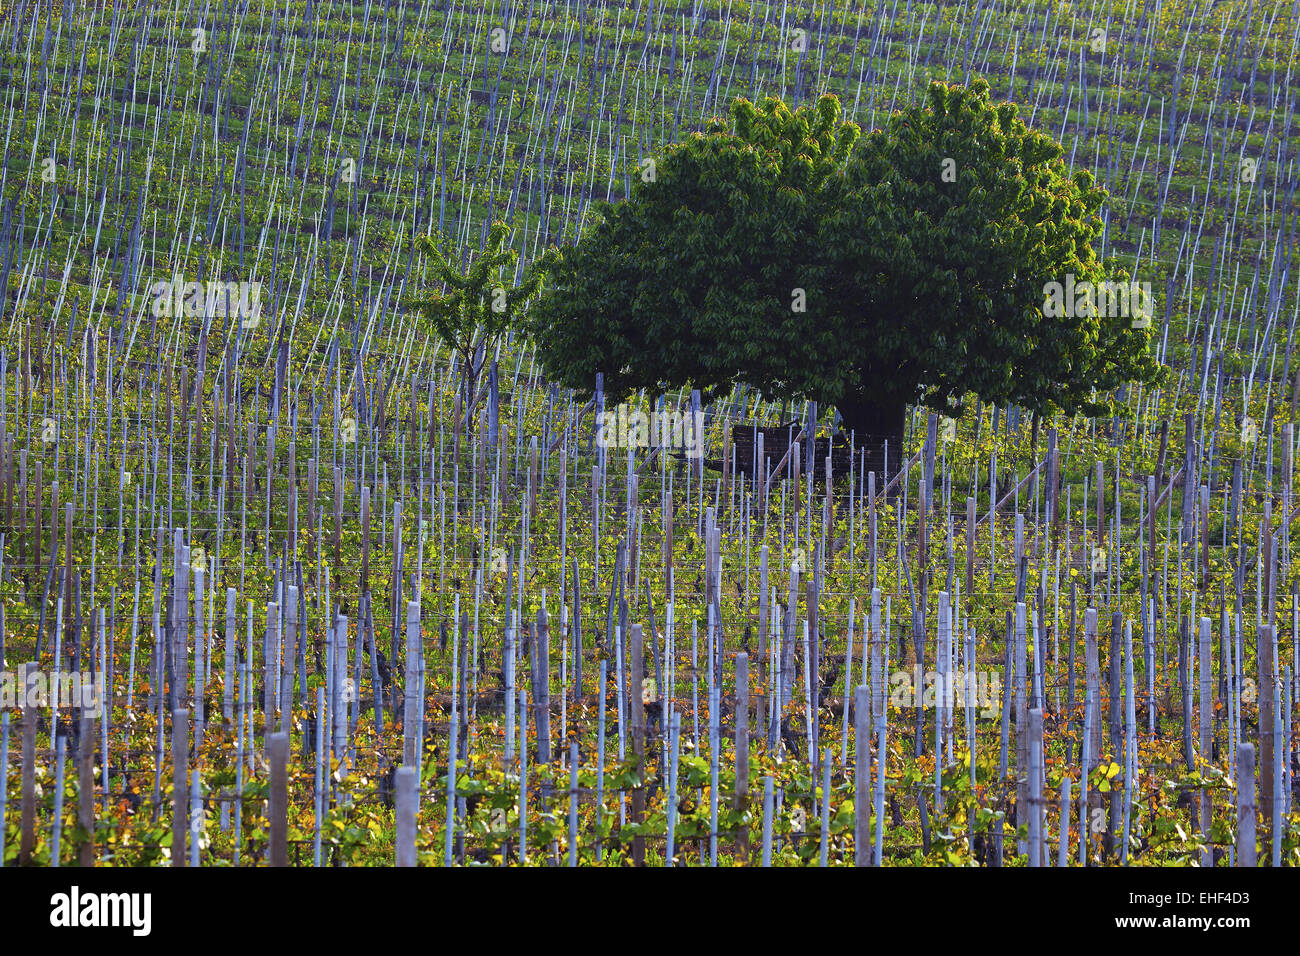 tree in vineyard, Barolo, Piedmont, Italy - Stock Image